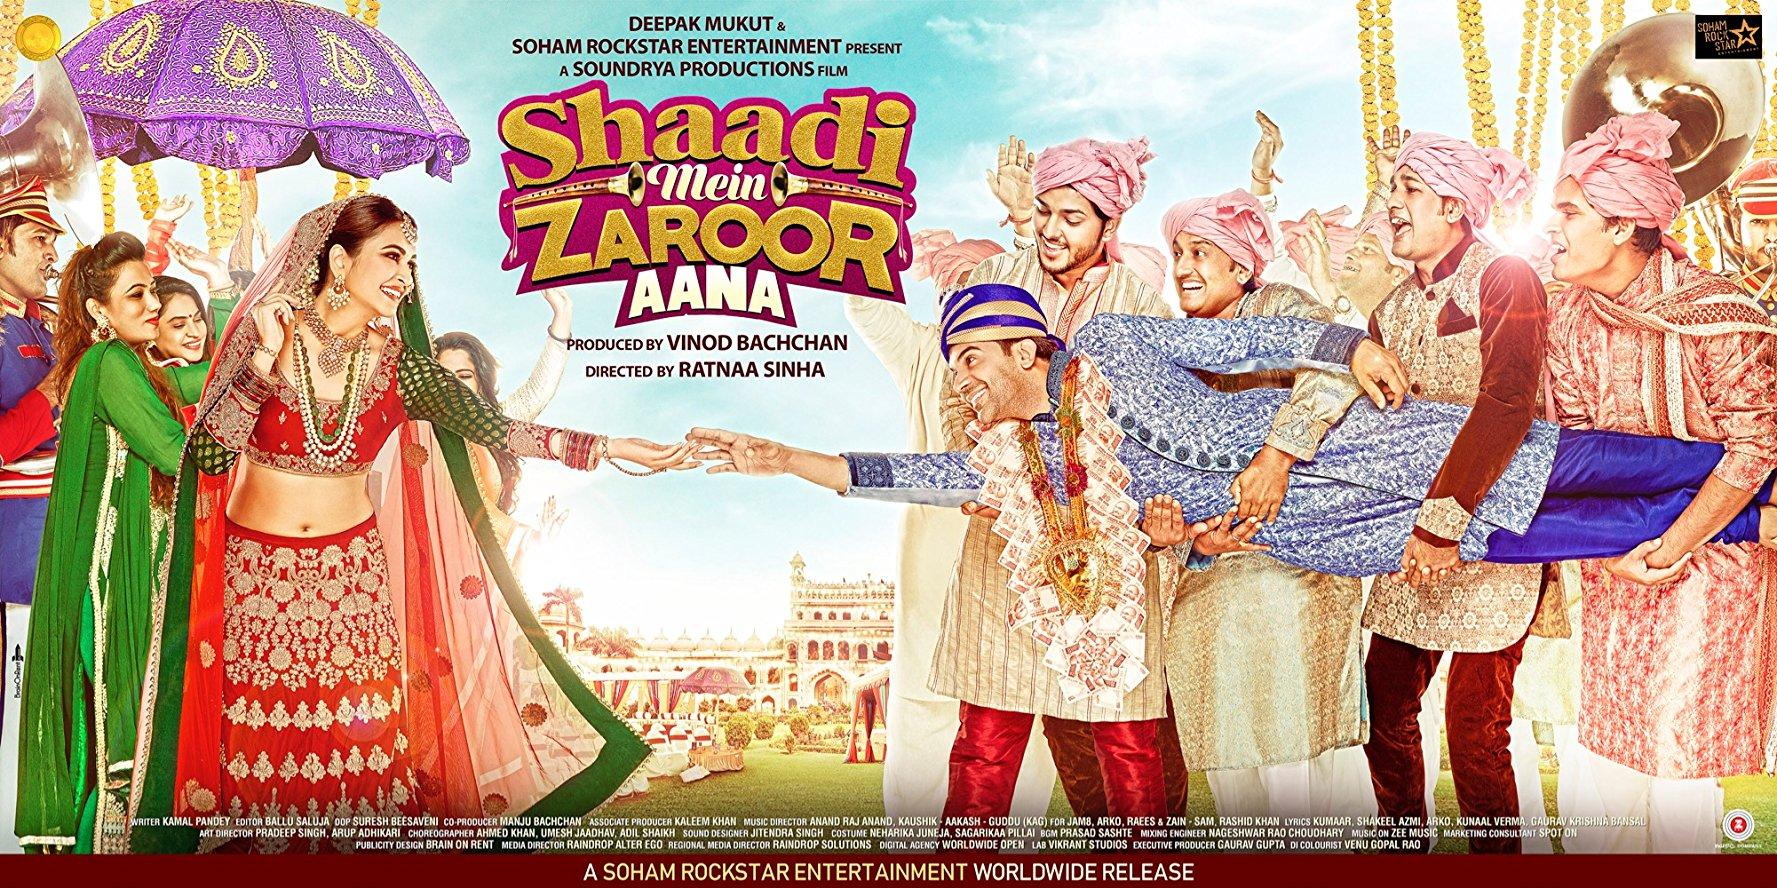 Shaadi Mein Zaroor Aana Movie Screened at Rashtrapati Bhavan